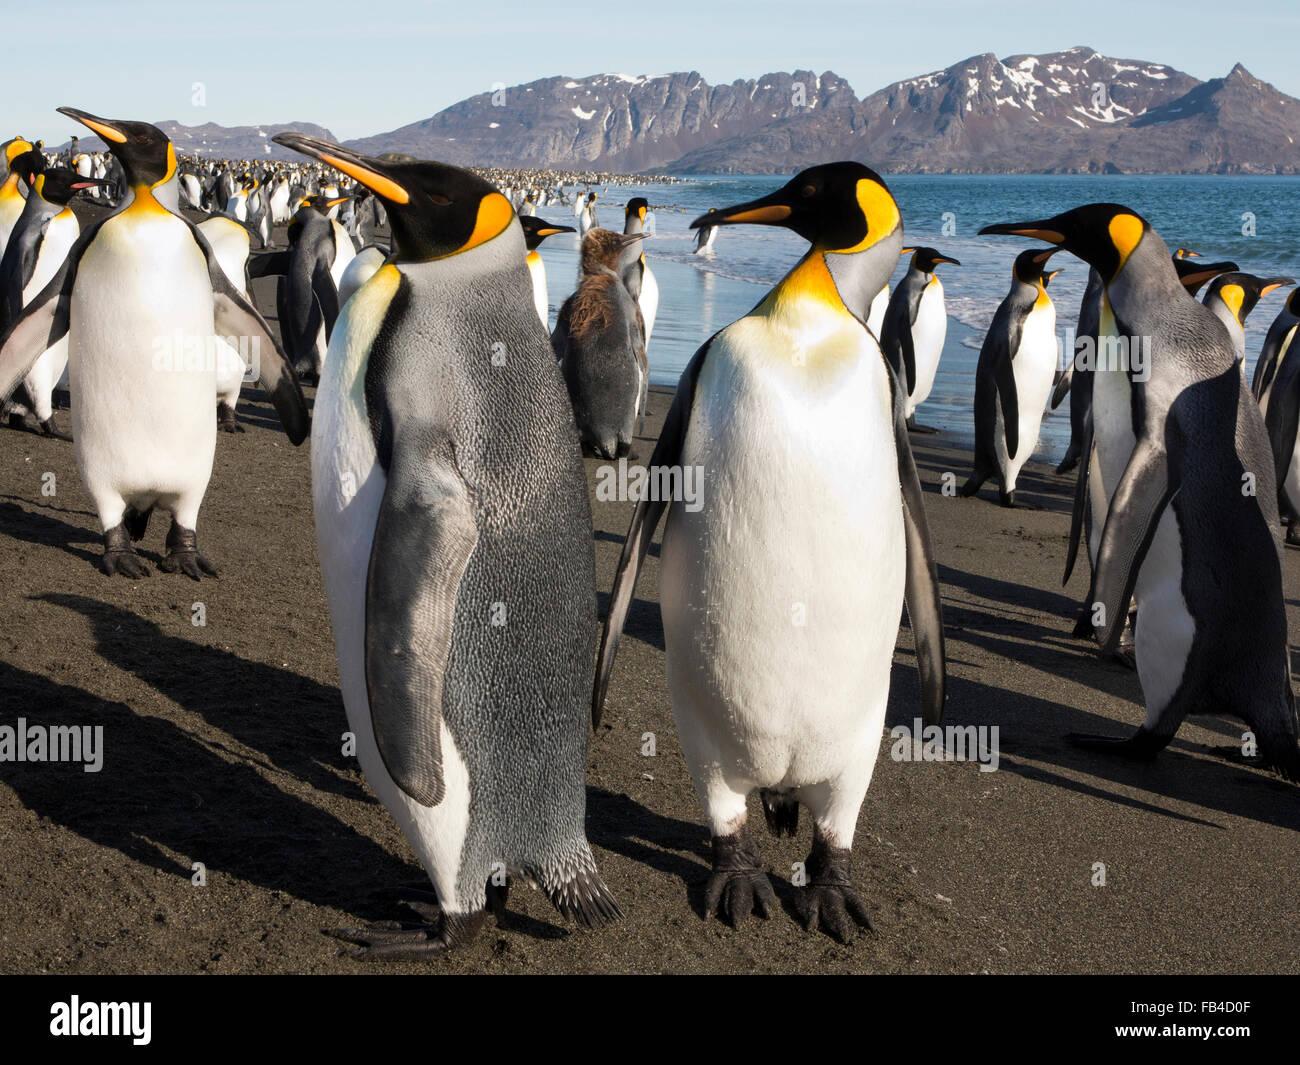 South Atlantic, South Georgia, Bay of Isles, king penguins on Salisbury Plain beach - Stock Image